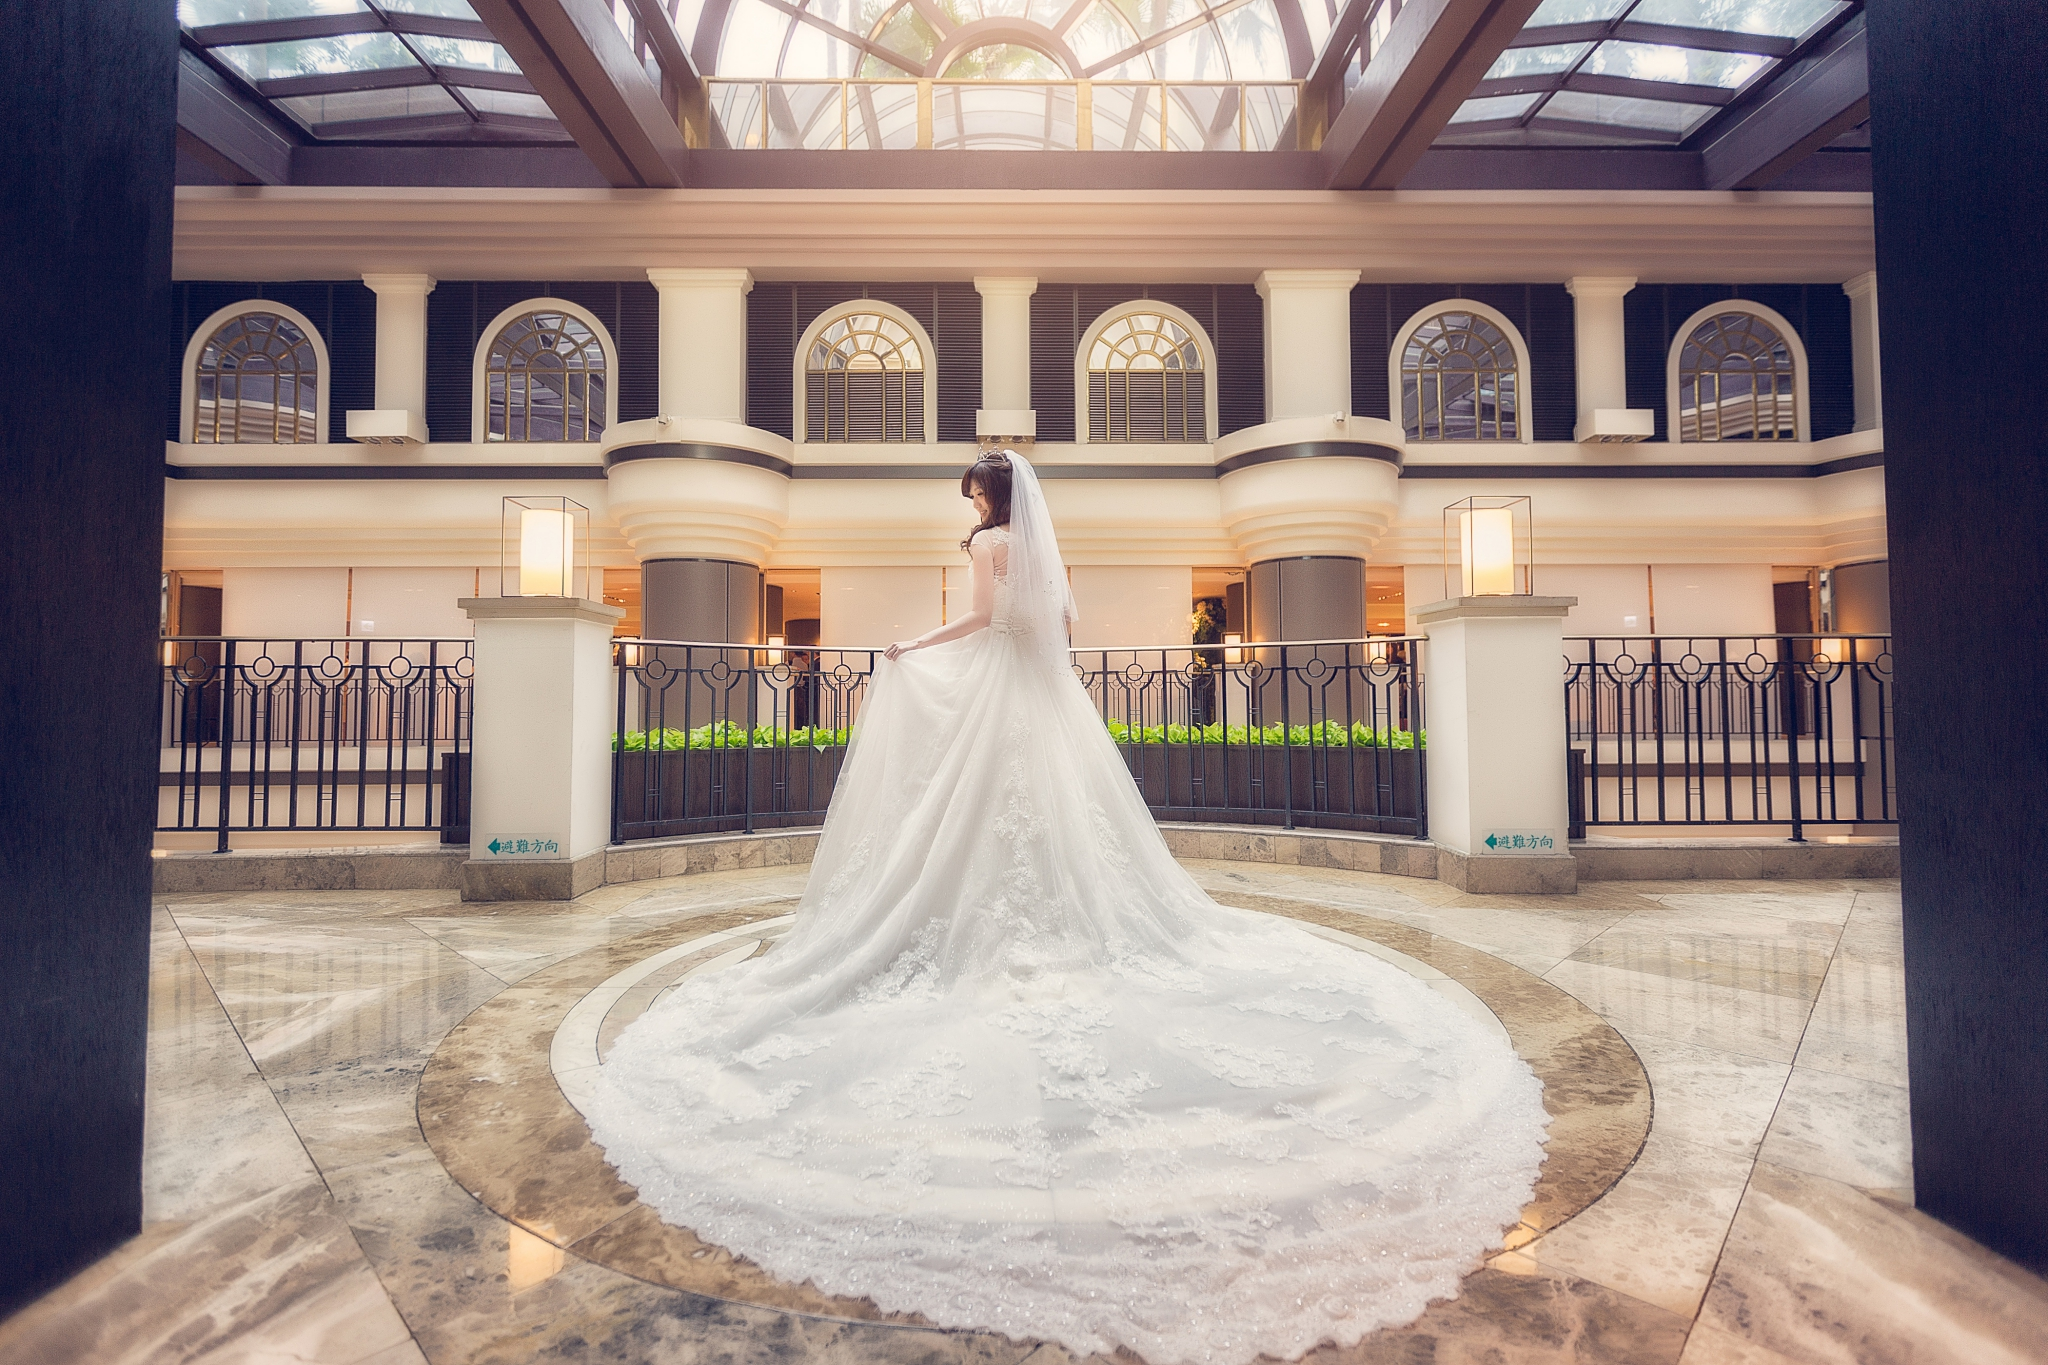 004-wedding